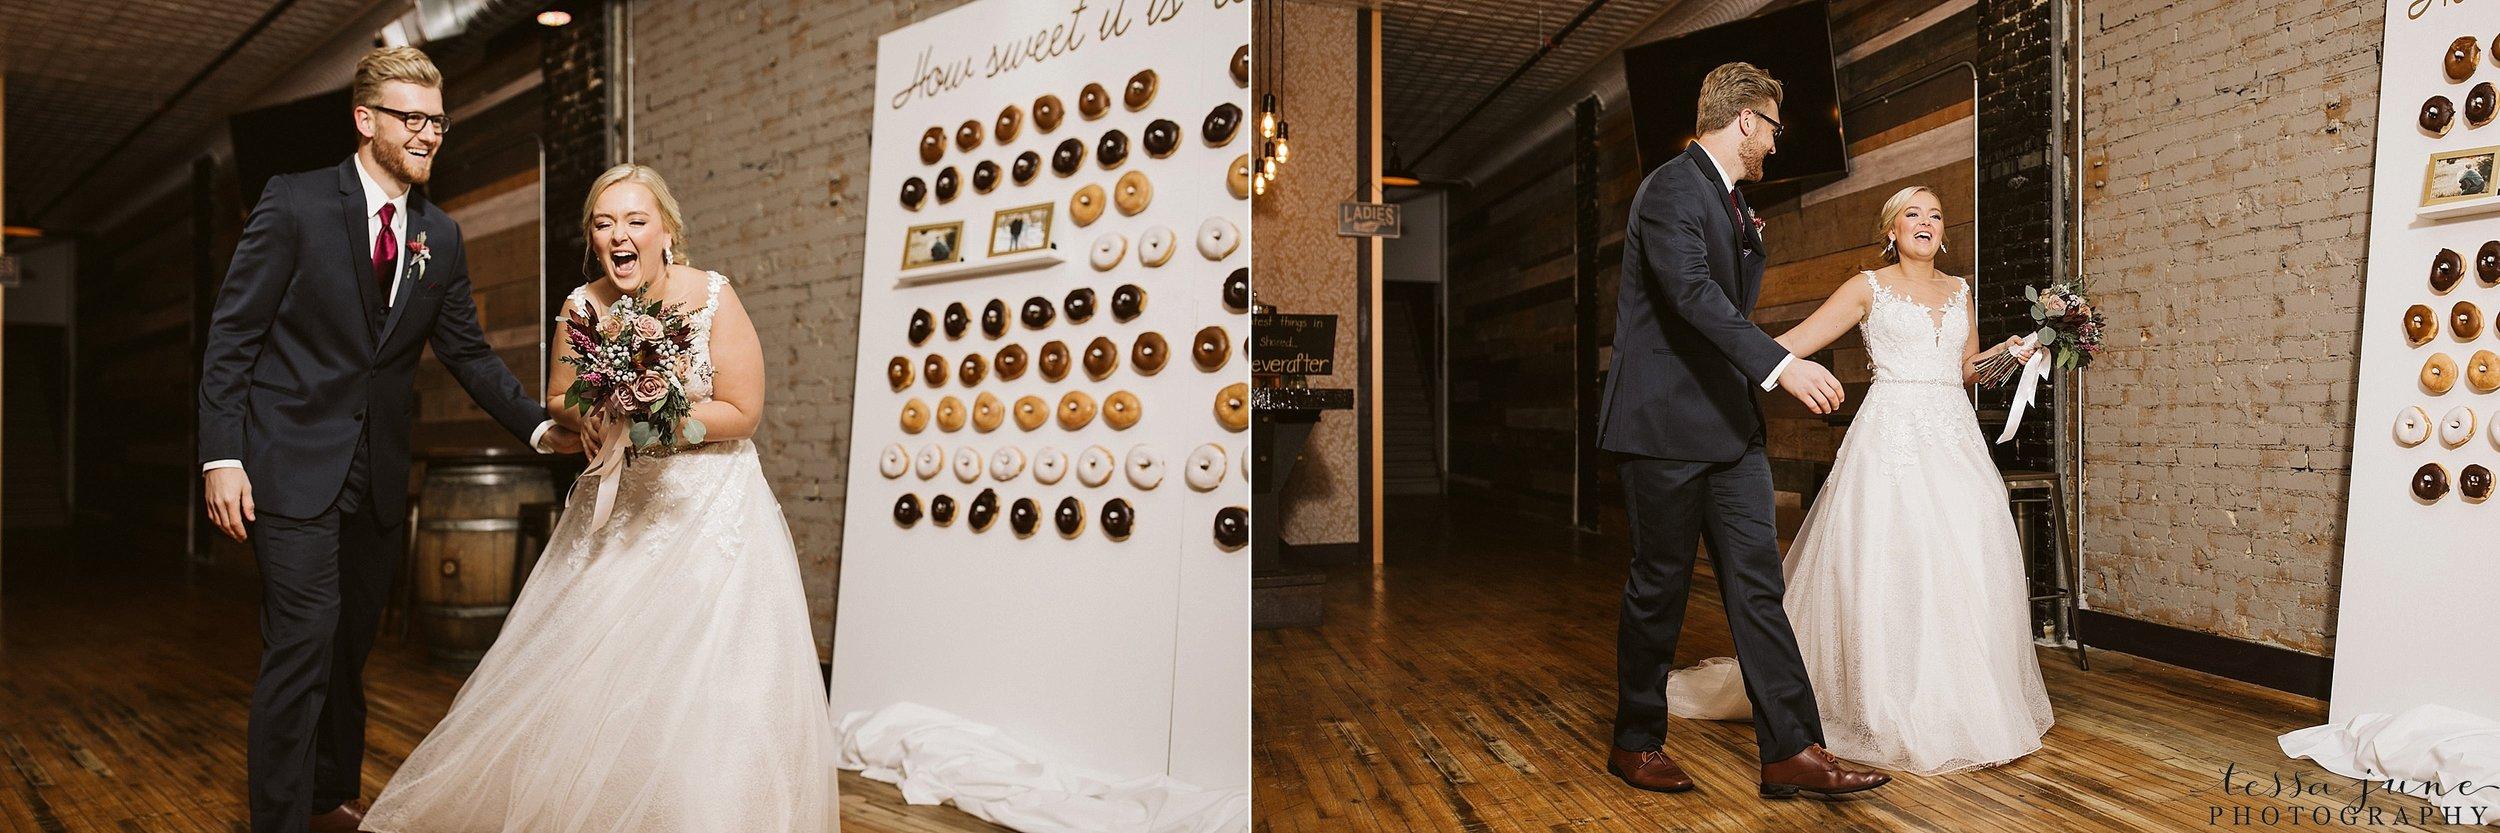 the-3-ten-event-venue-november-elegant-cozy-wedding-faribault-minnesota-125.jpg